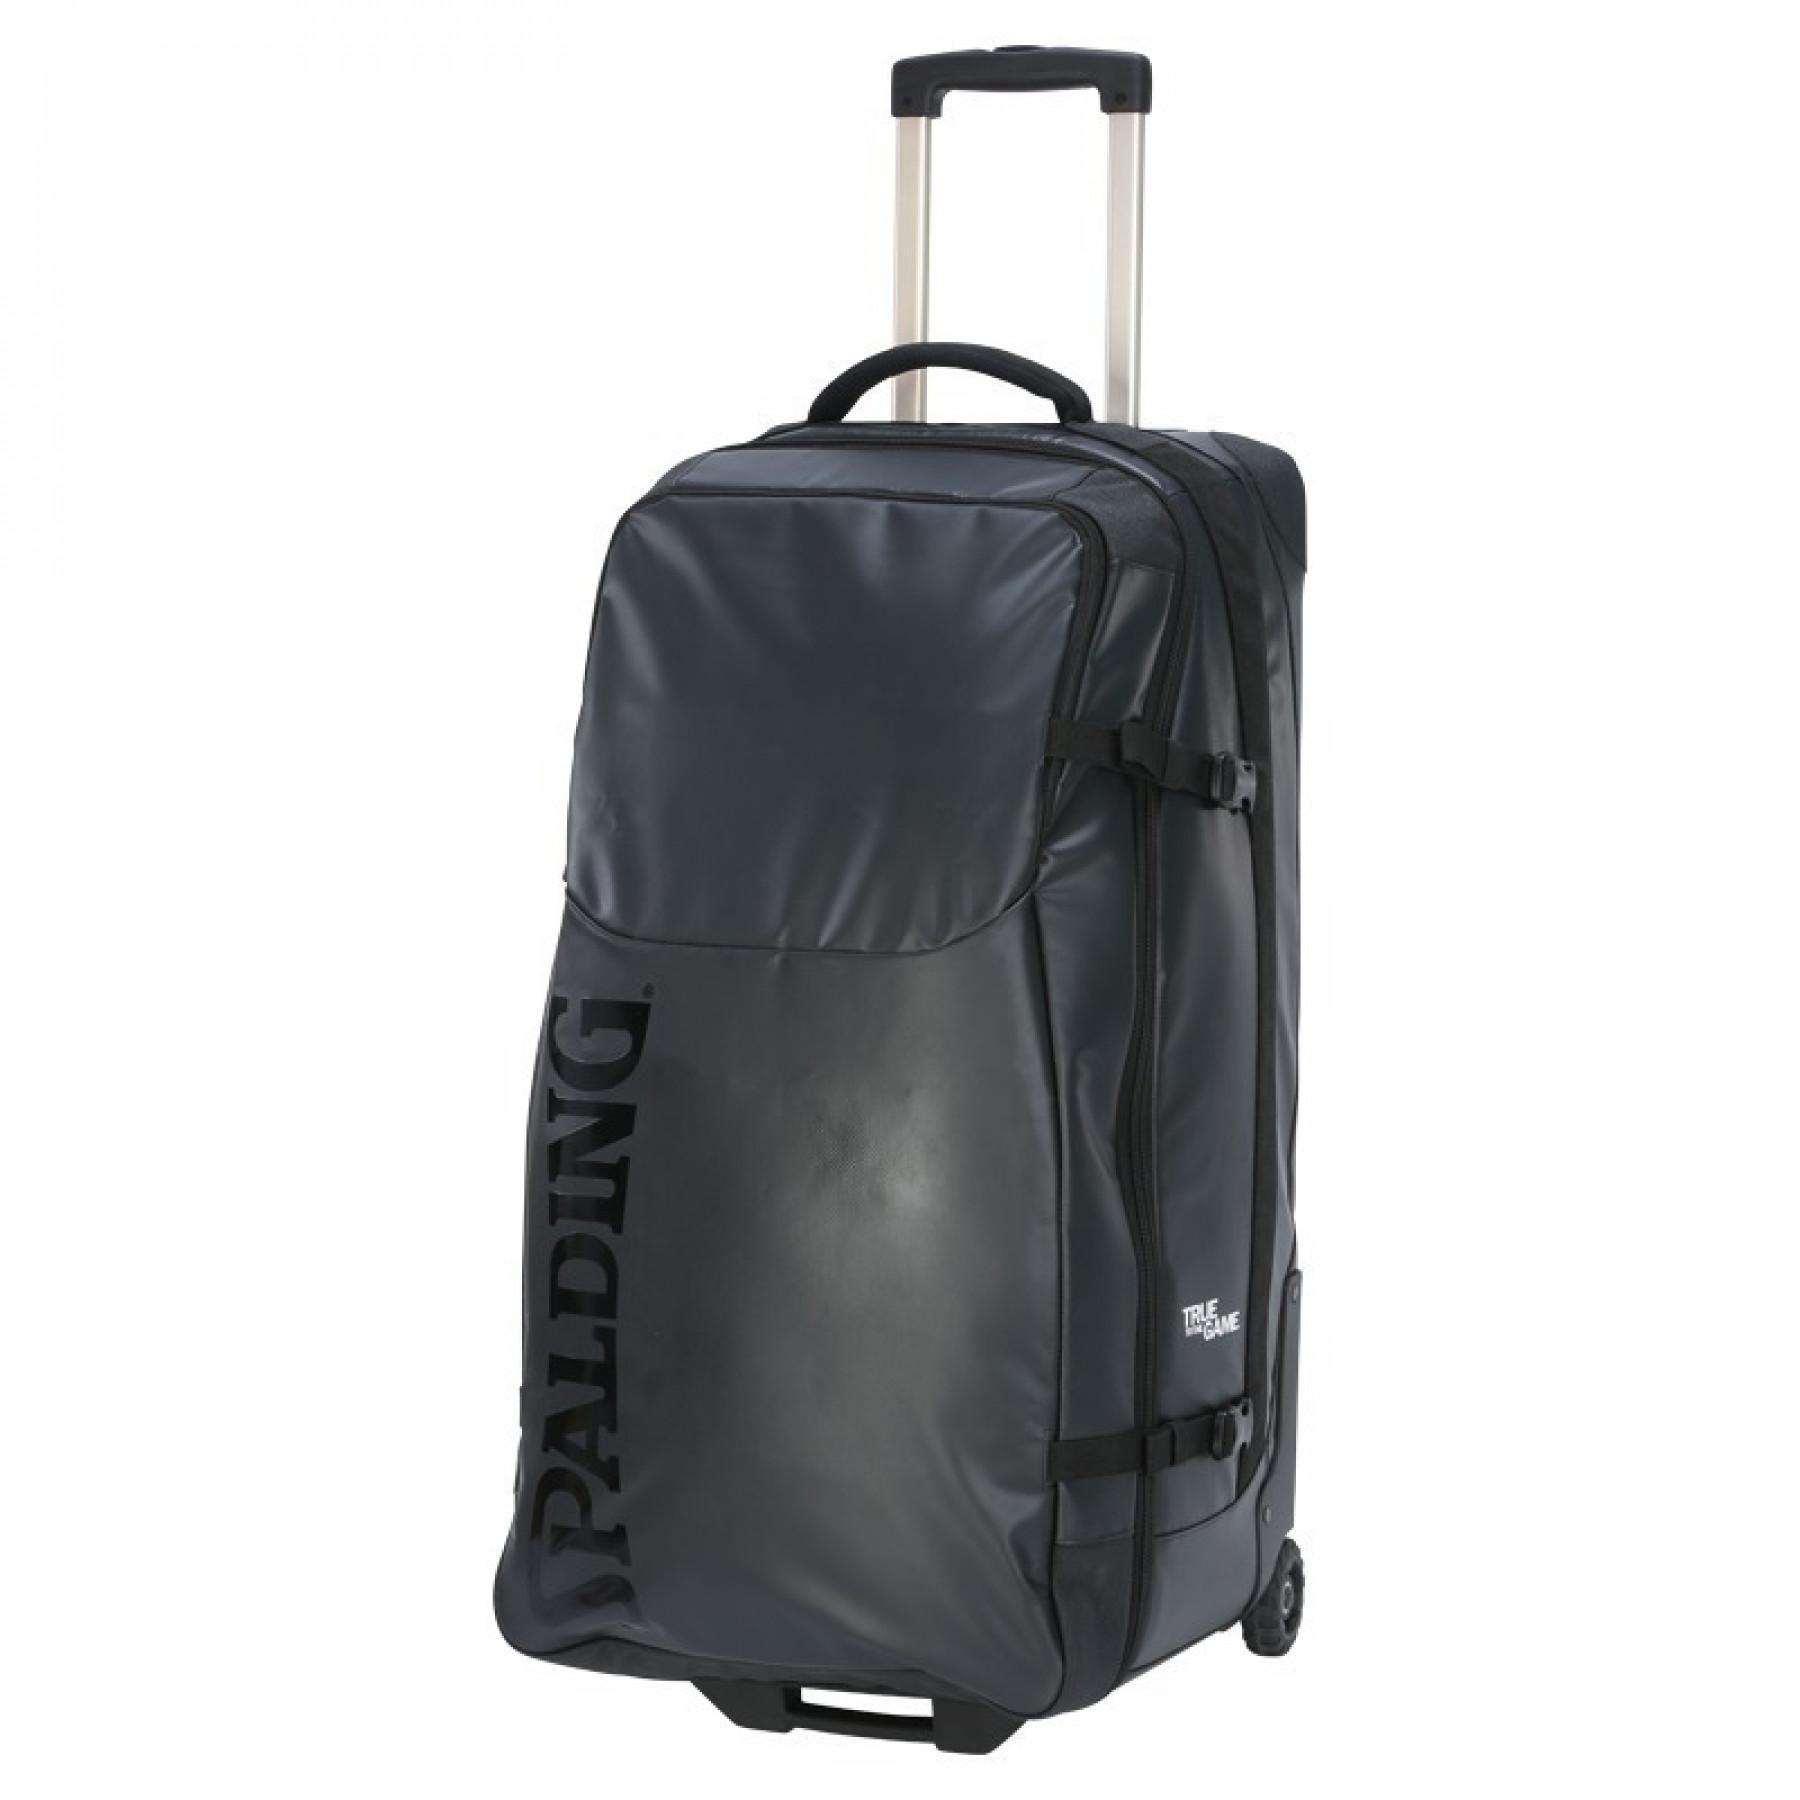 Trolley bag Spalding Premium sports 100L